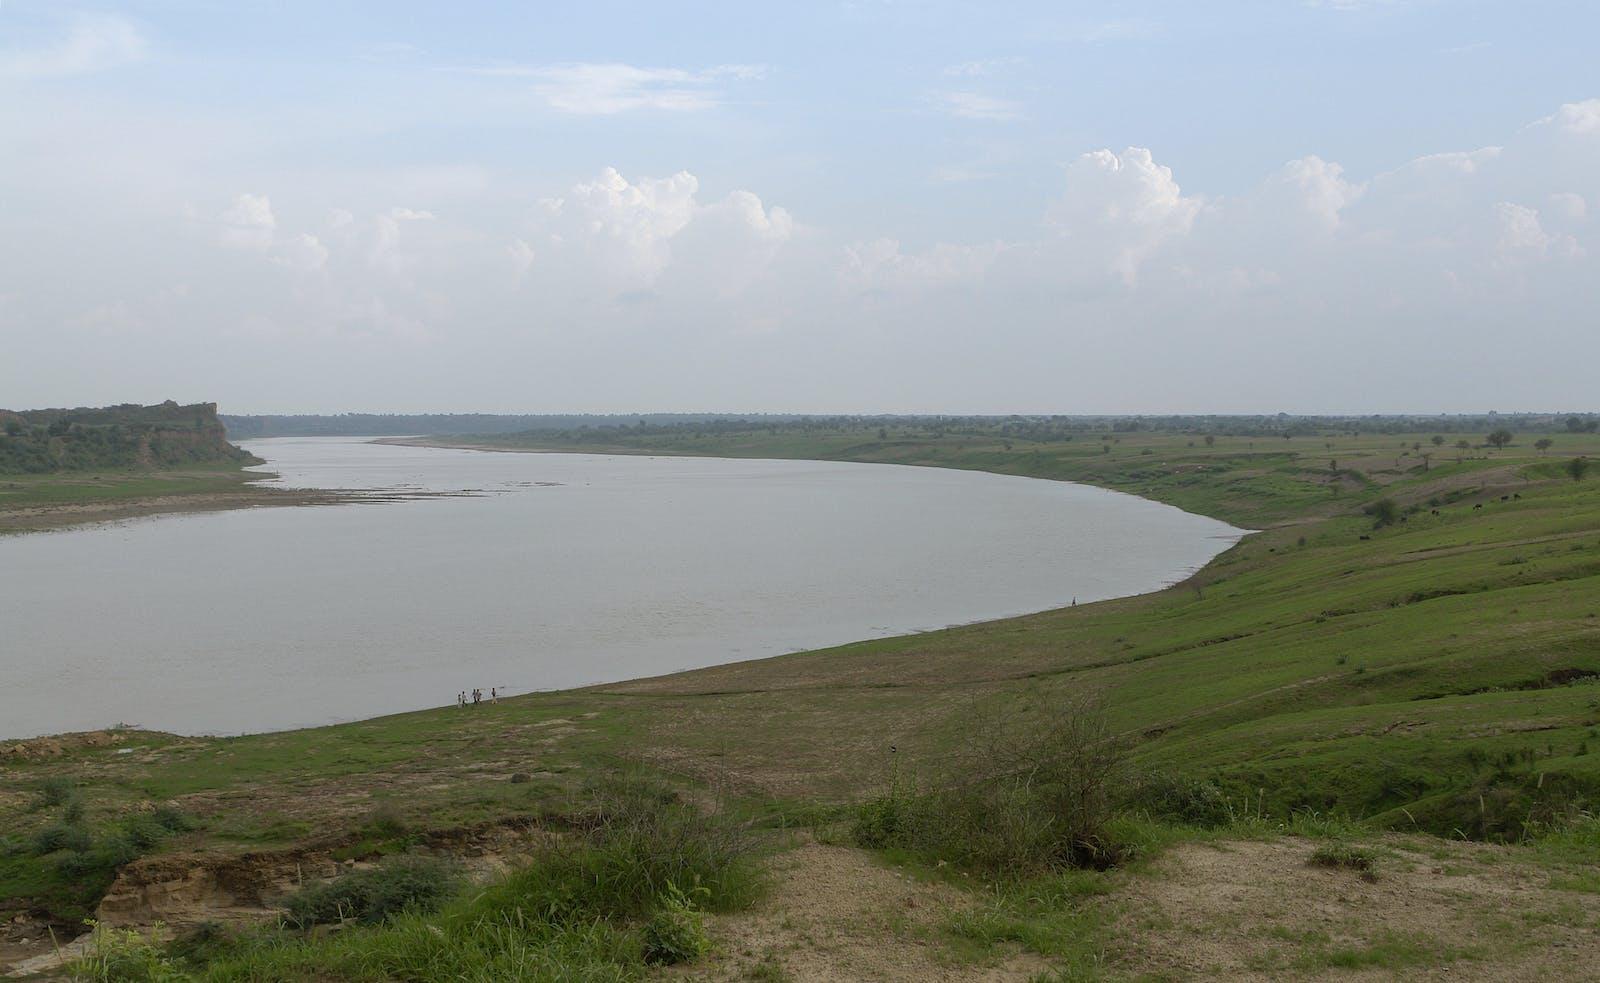 Upper Gangetic Plains Moist Deciduous Forests